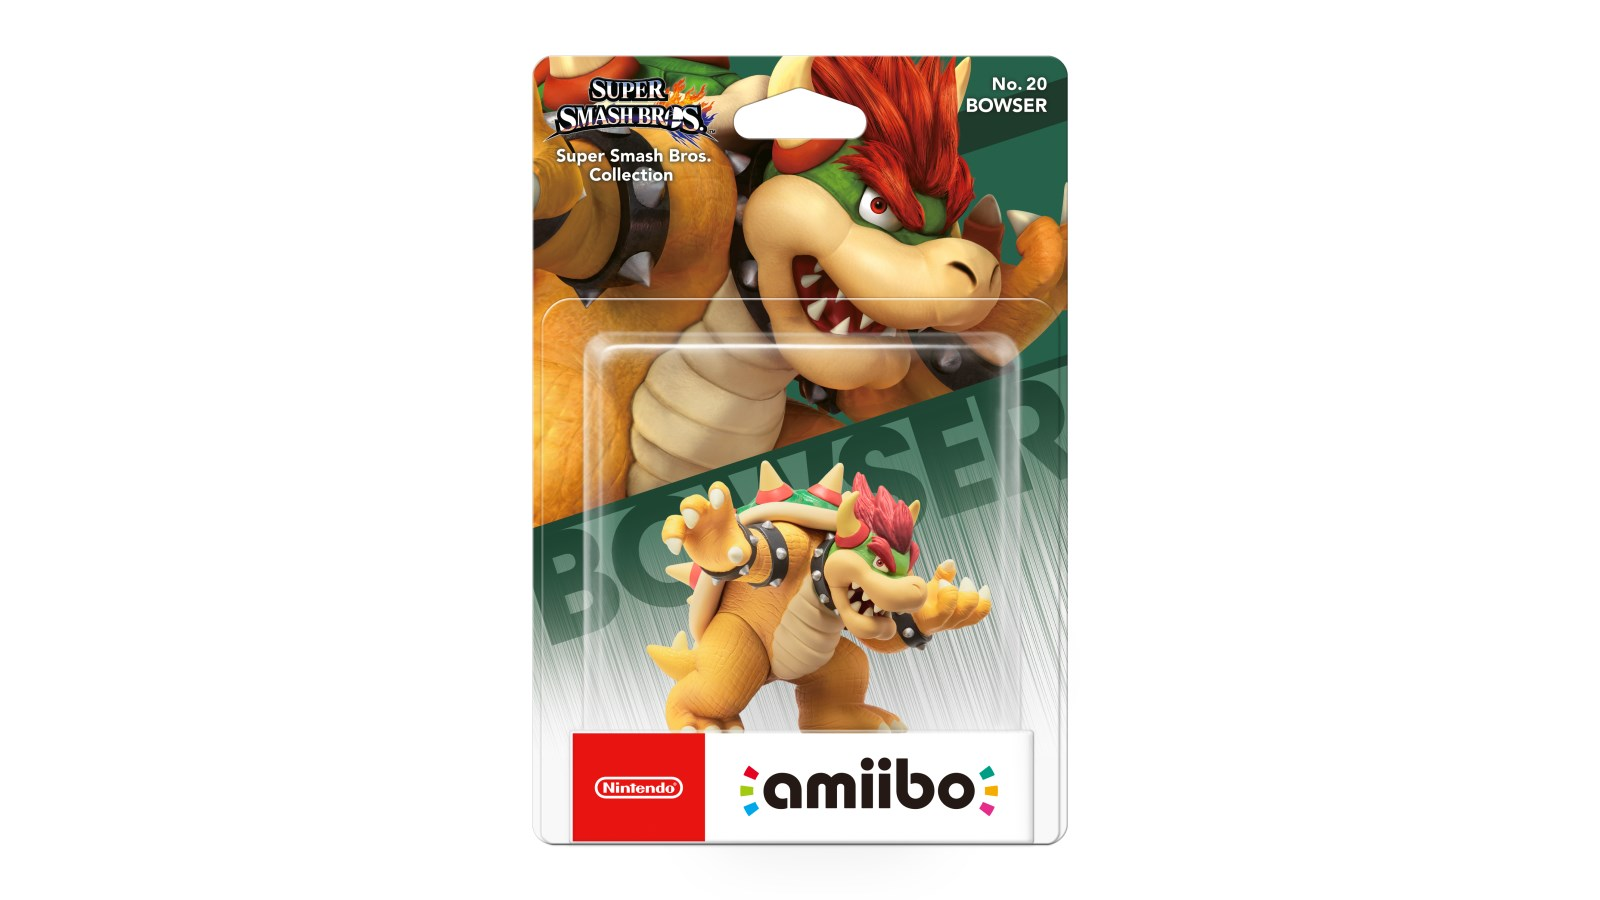 אמיבו – Bowser (סדרת Super Smash Bros)